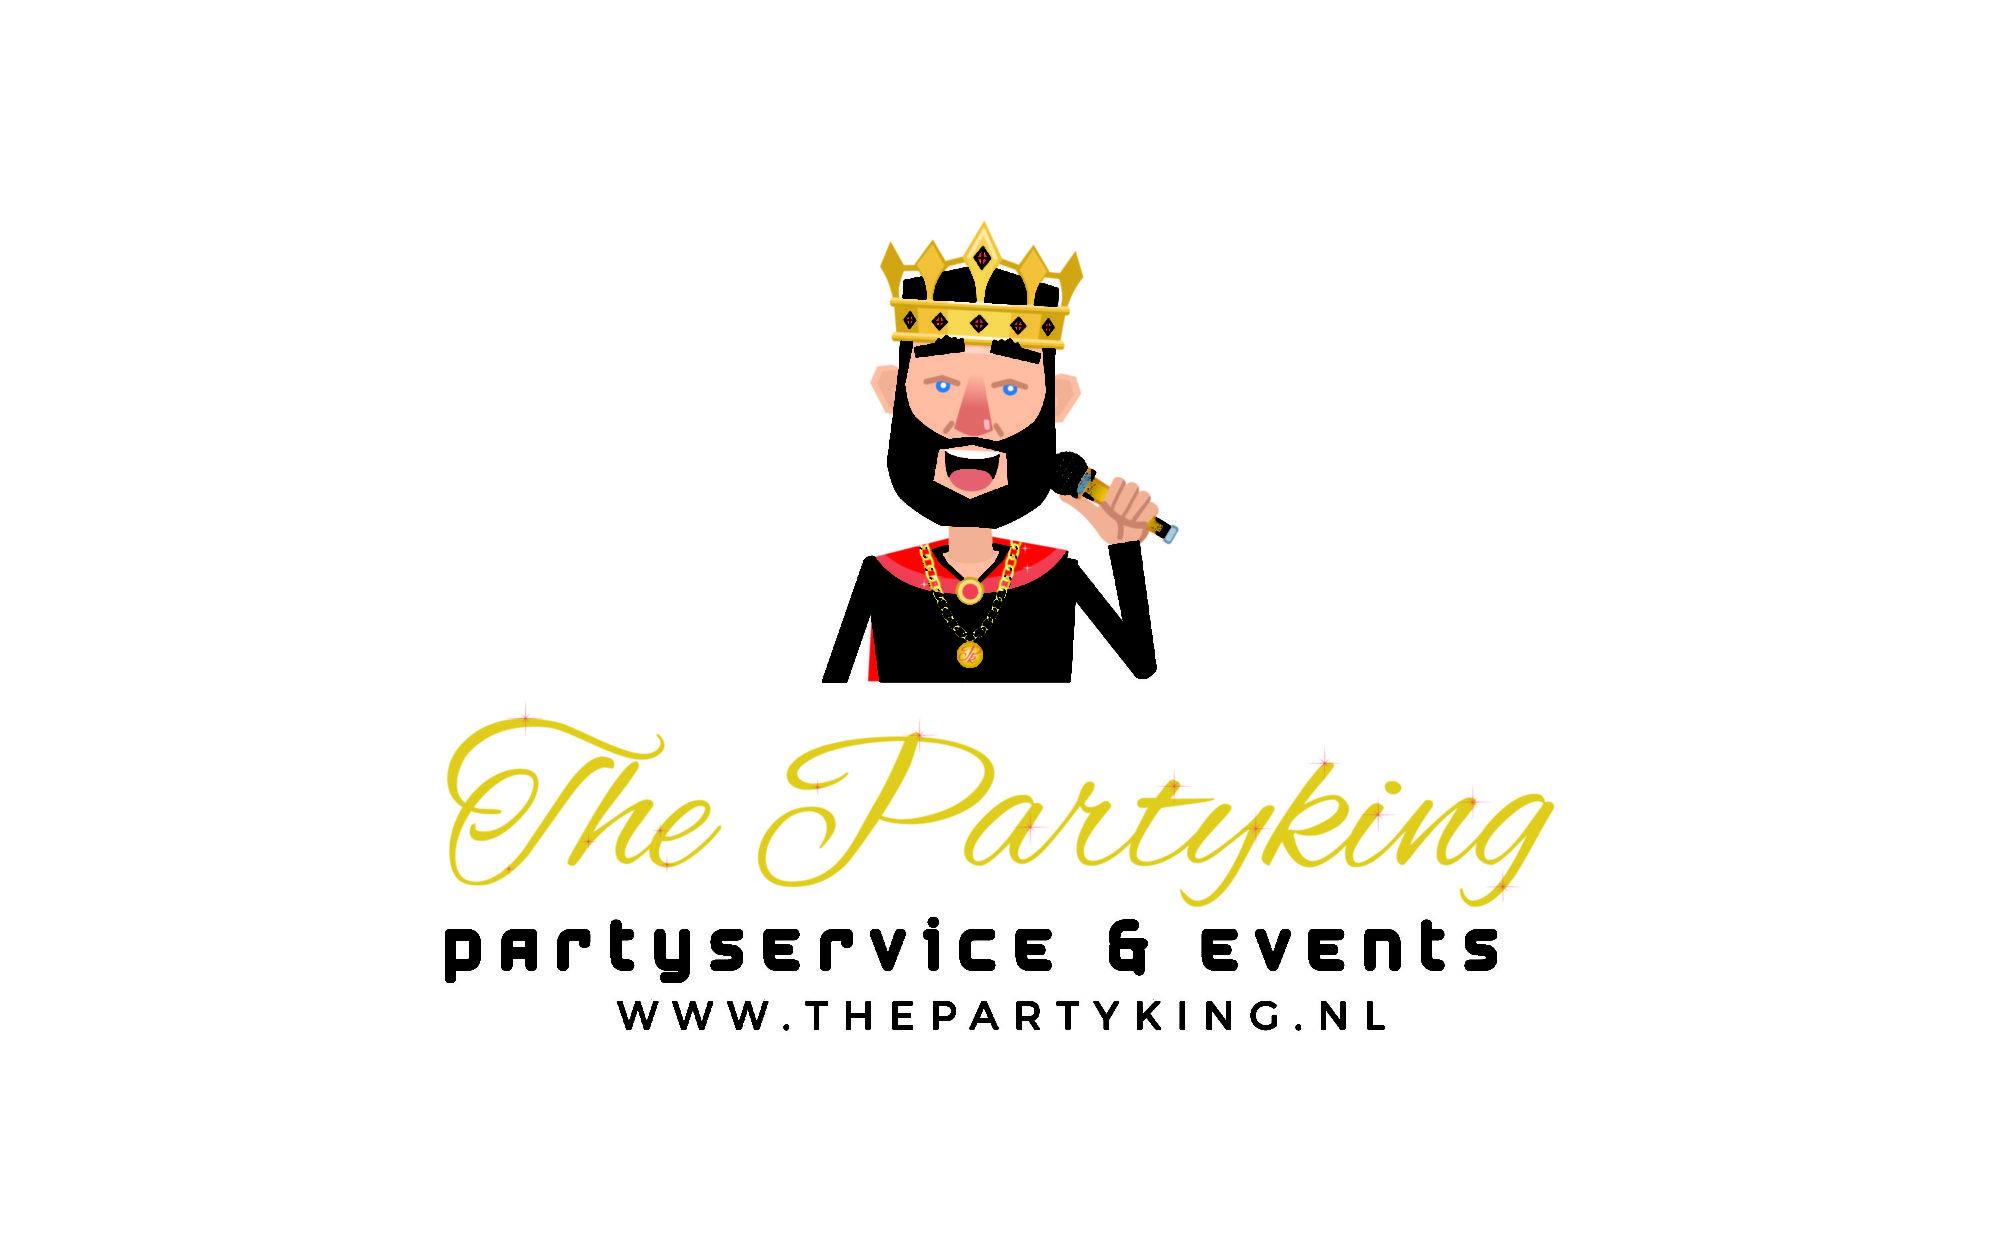 www.thepartyking.nl